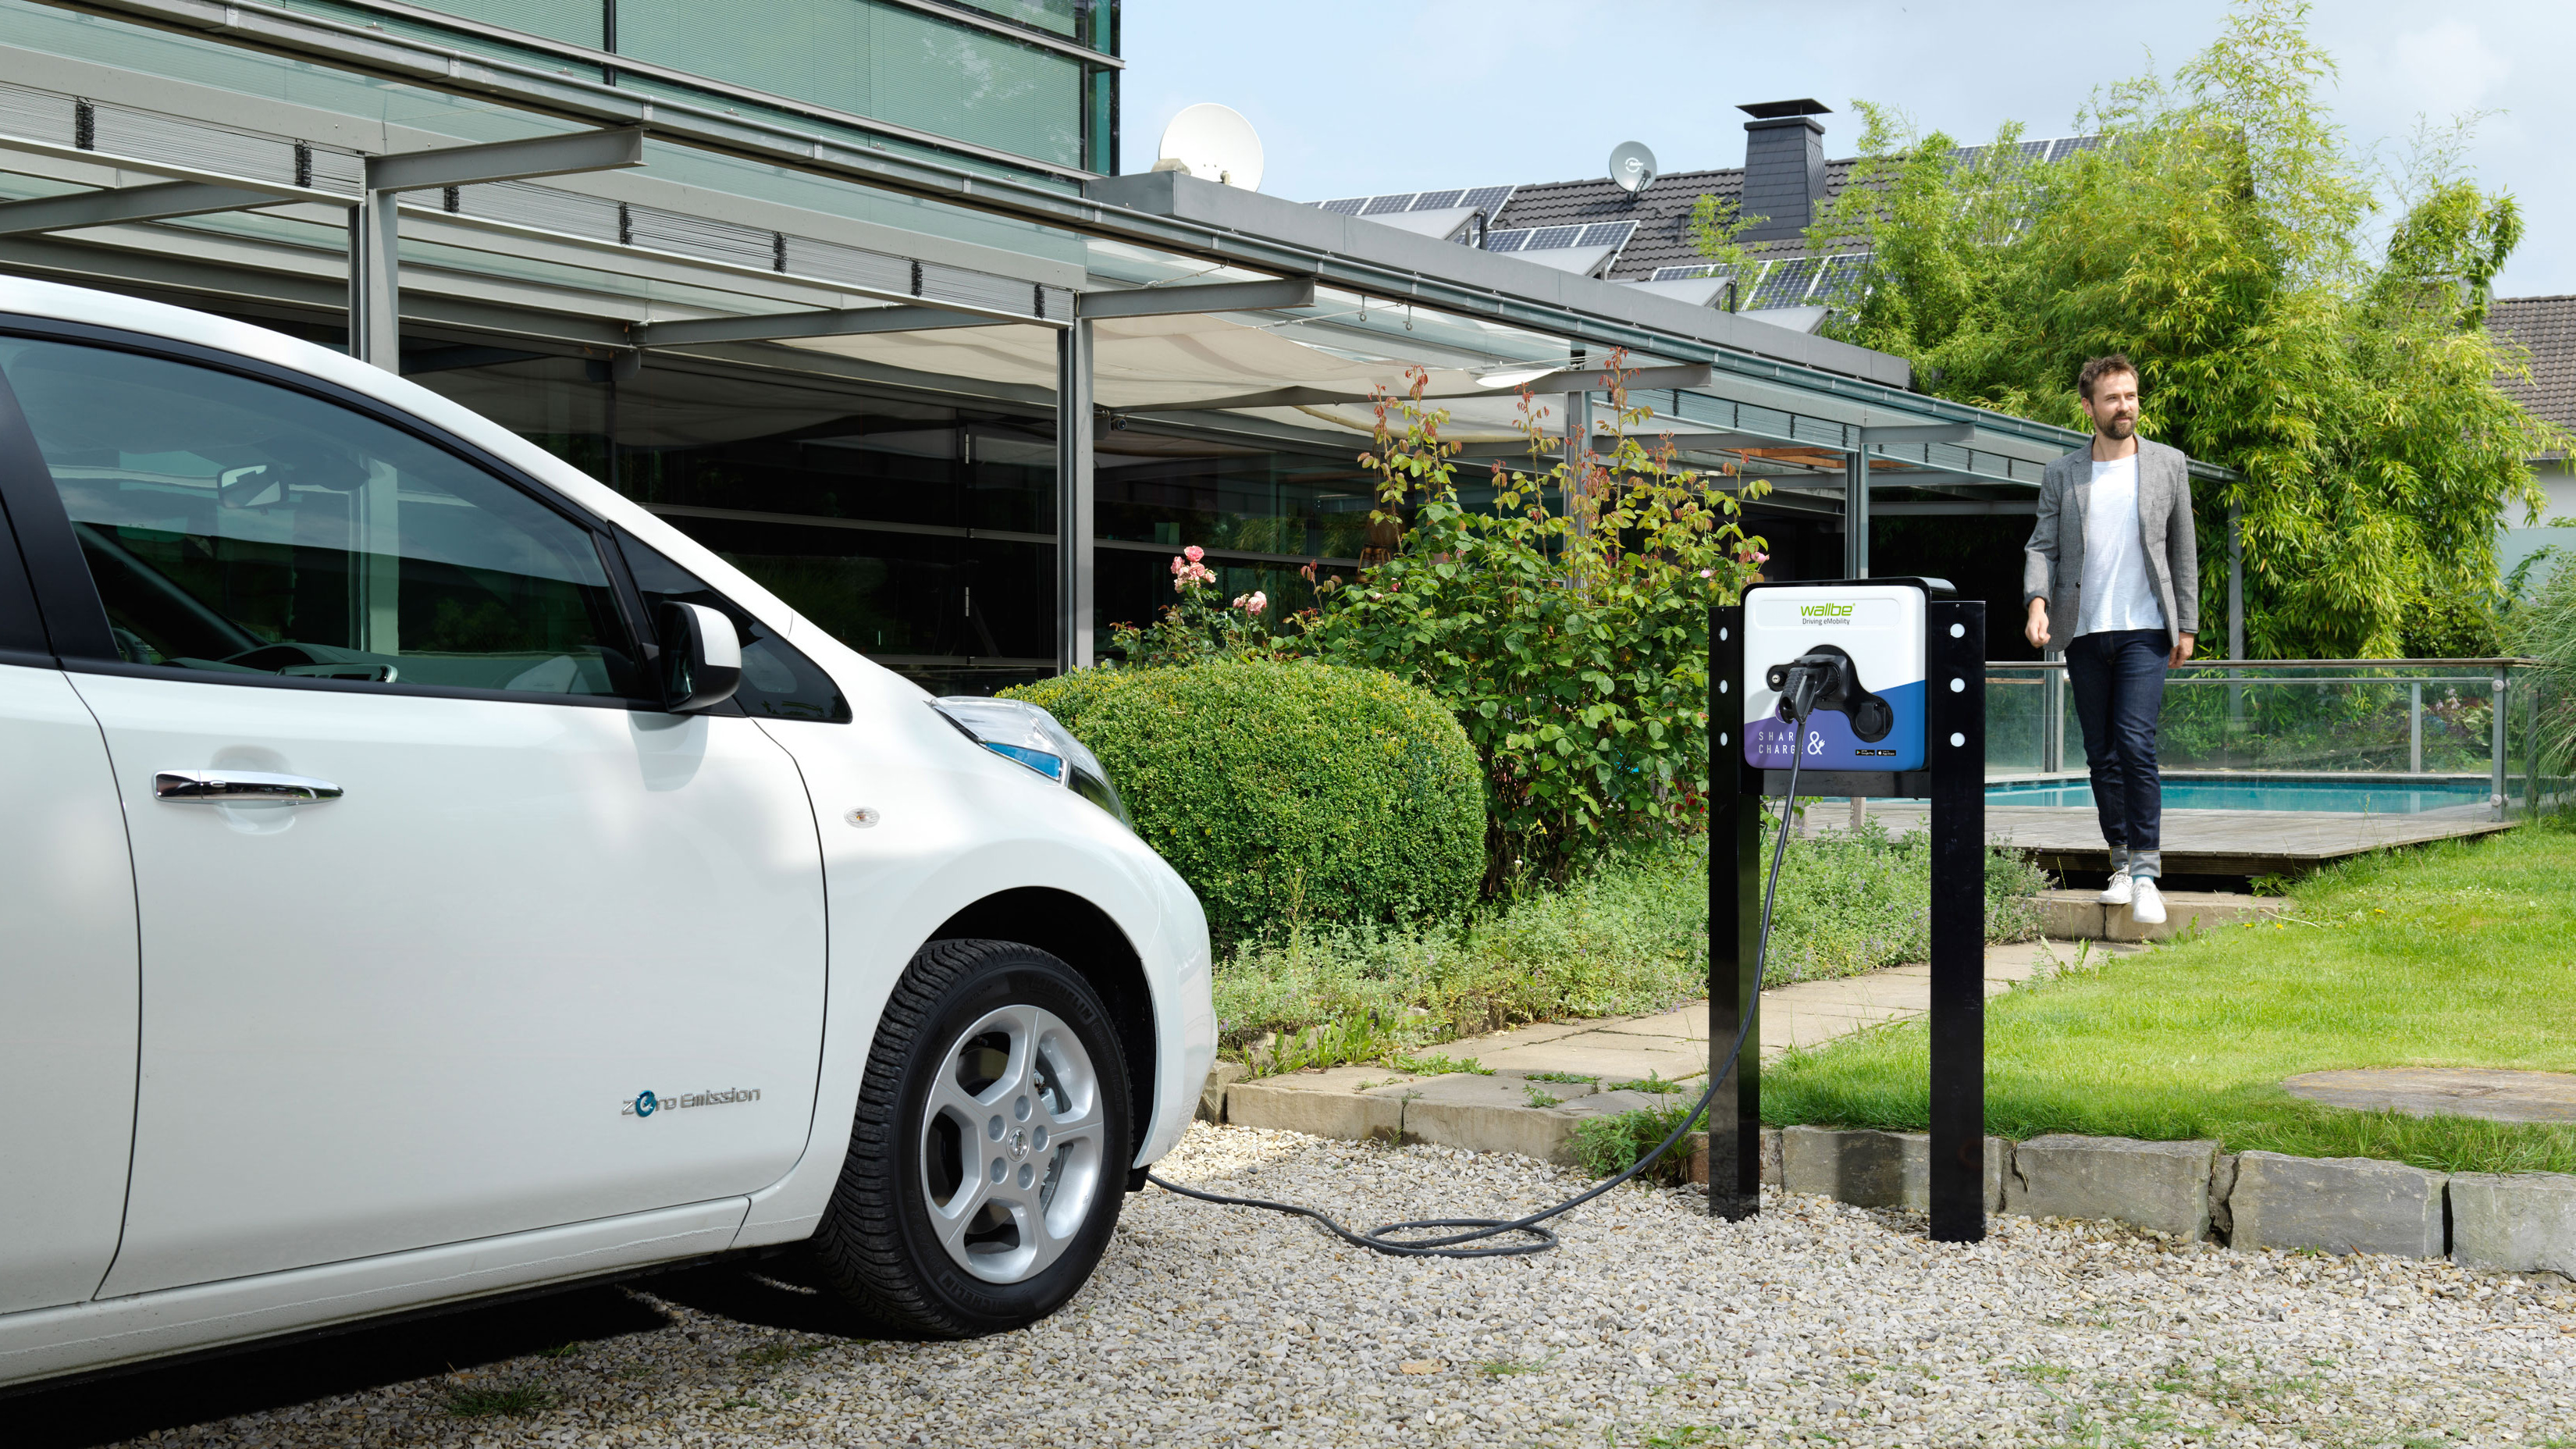 Sofortprogramm Elektromobilität: NRW fördert private Ladepunkte